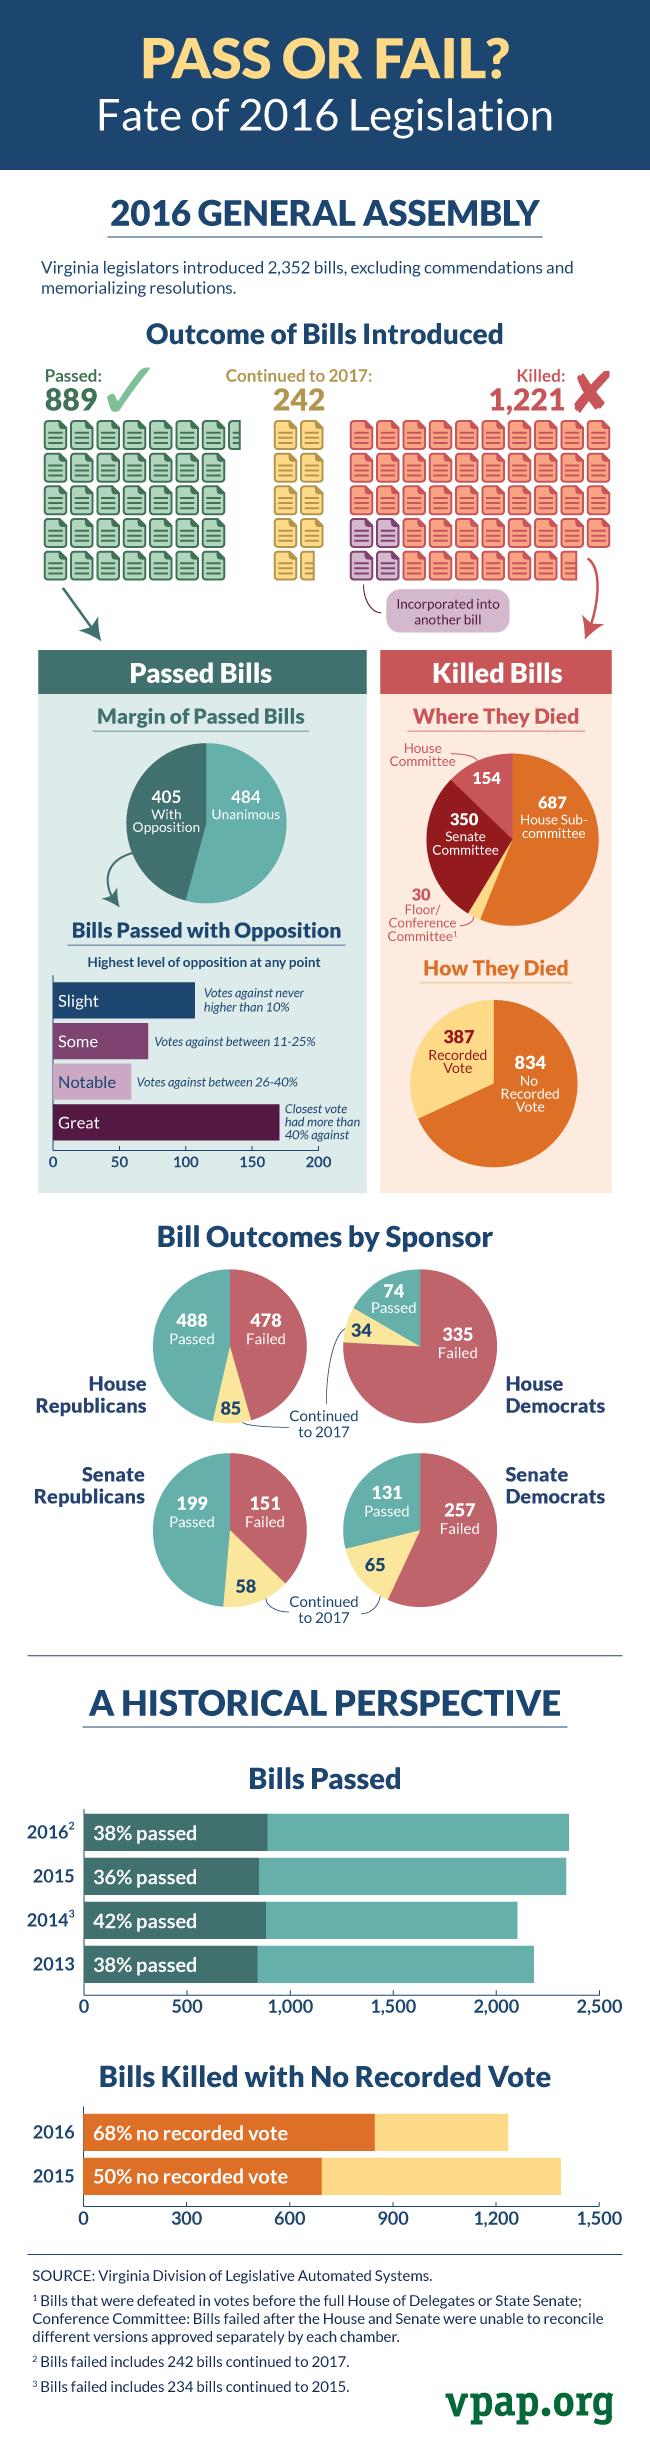 fate-of-2016-legislation